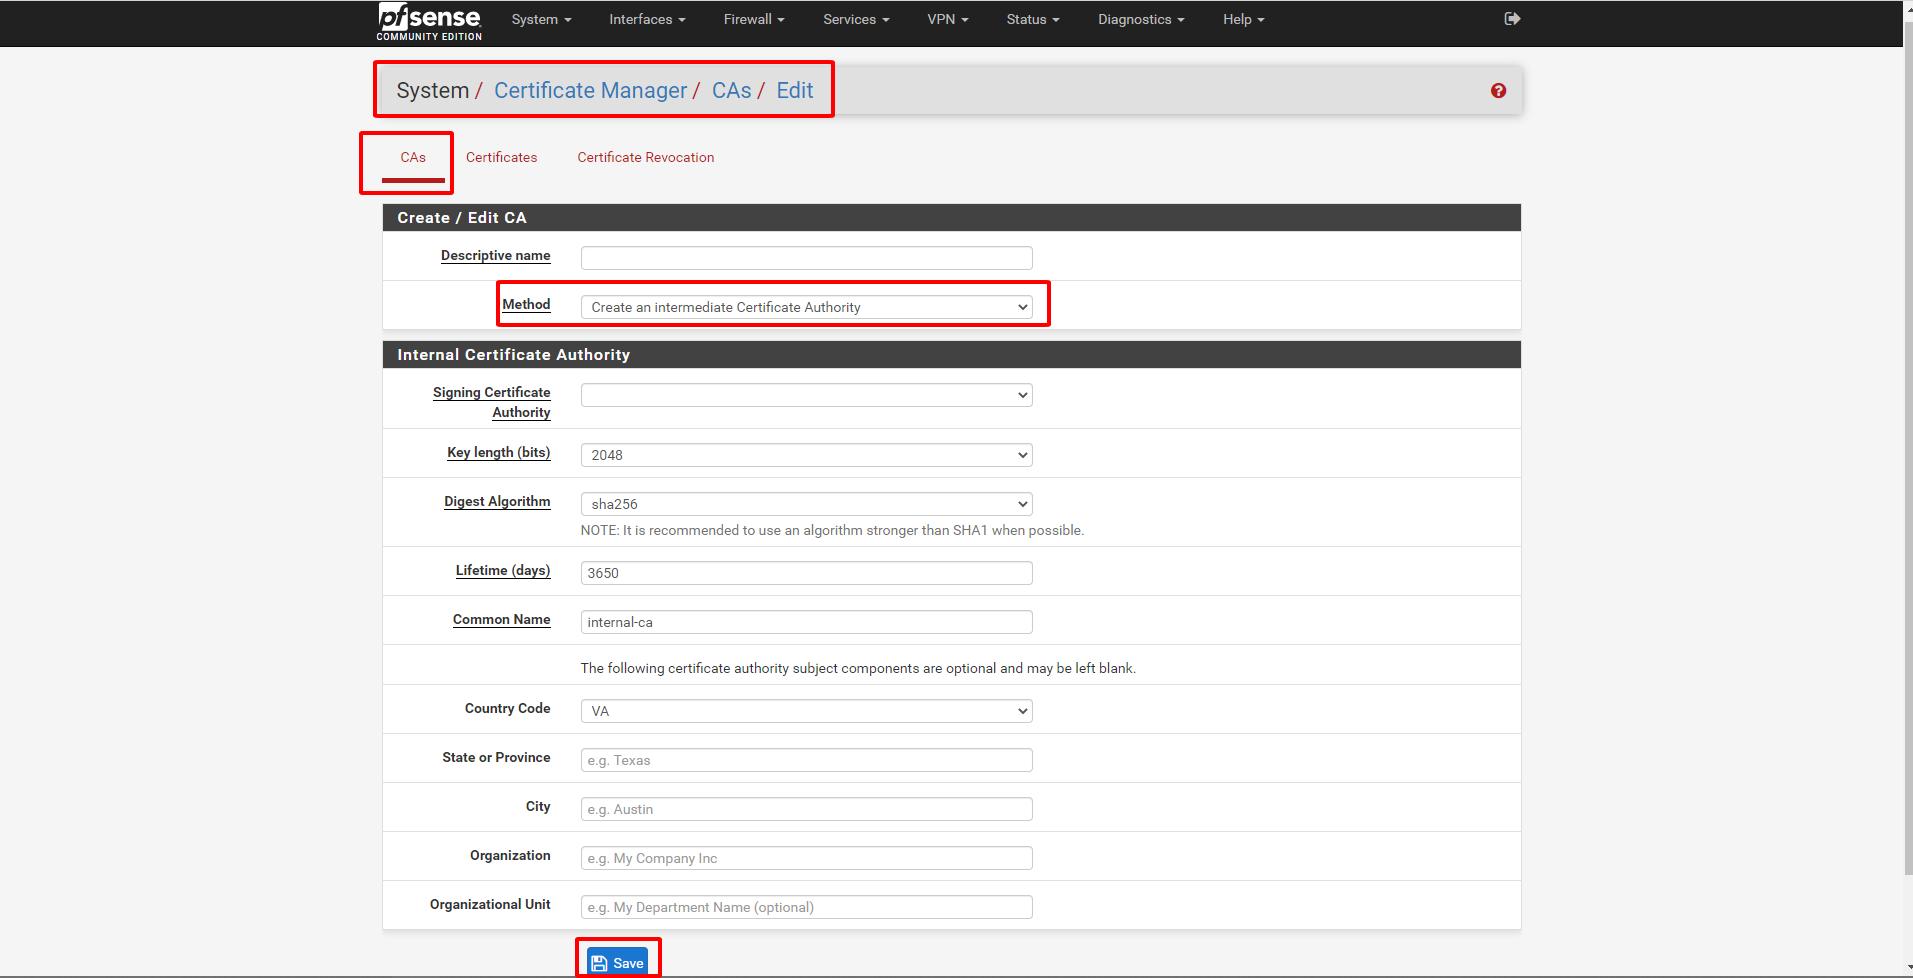 pfsense 10 - Certificate Management (Tìm Hiểu Về PfSense Phần 8)